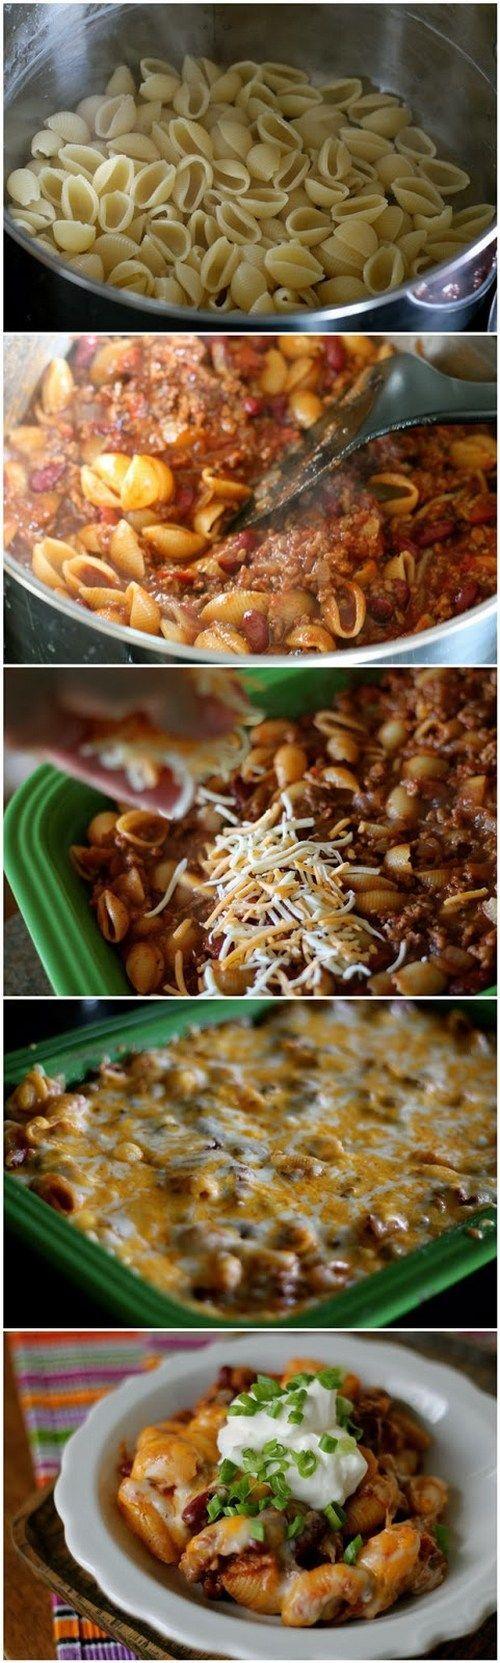 Shells in bolognese sauce, and shredded cheese frigoles Conchas en salsa boloñesa, frigoles y queso rayado Subido de Pinterest. http://www.isladelecturas.es/index.php/noticias/libros/835-las-aventuras-de-indiana-juana-de-jaime-fuster A la venta en AMAZON. Feliz lectura.